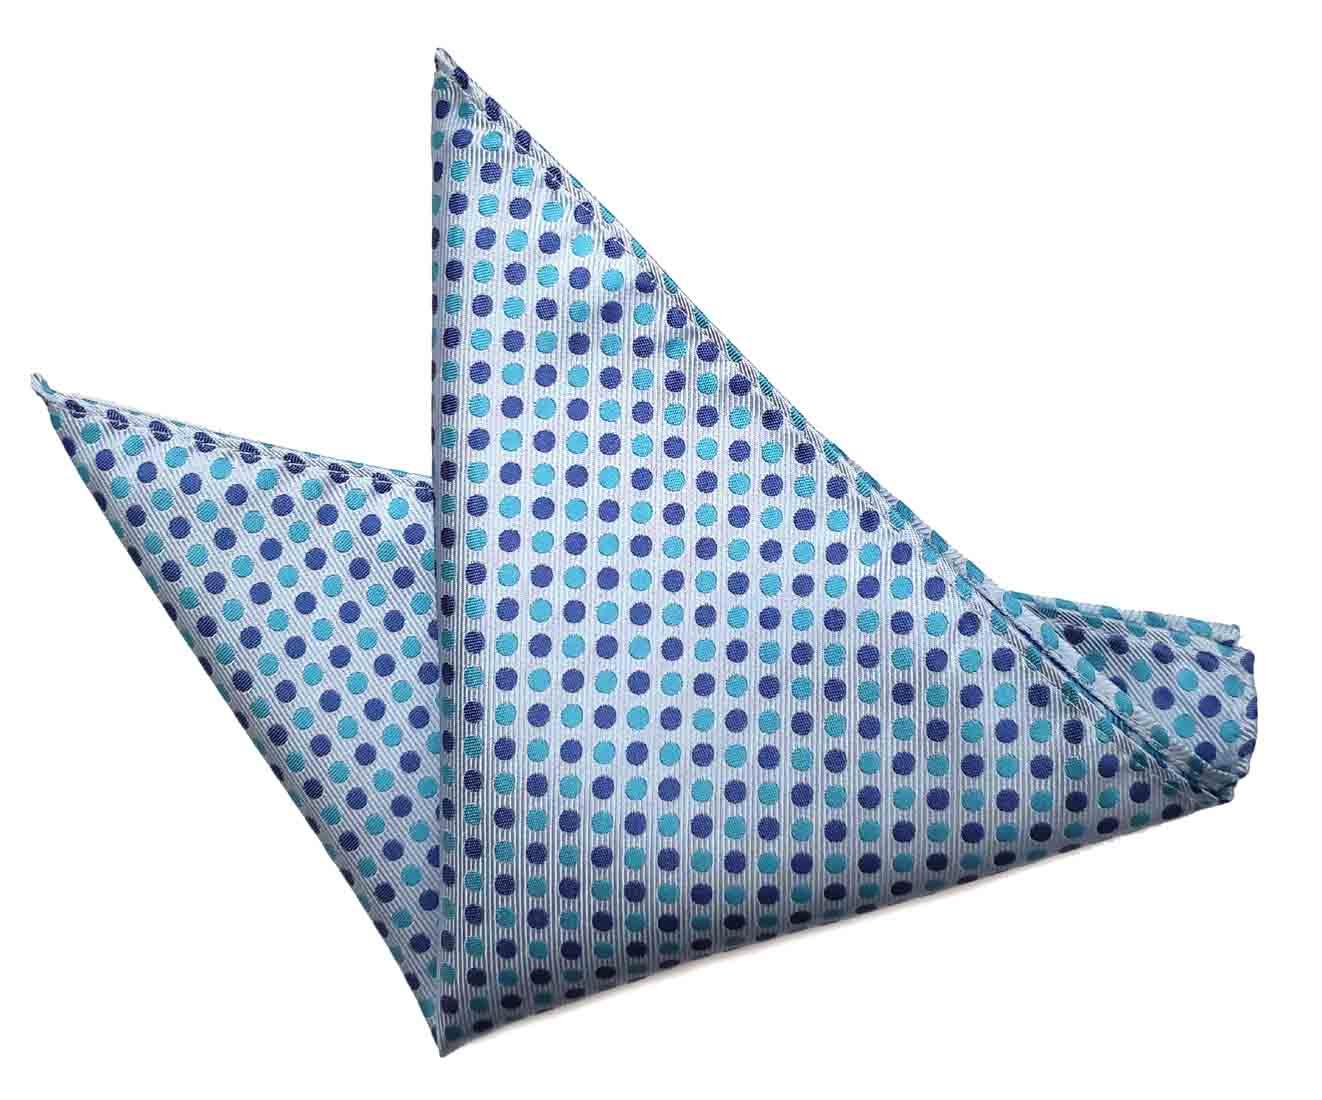 ekSel Pocket Square Blue Purple Polka Dot Men's